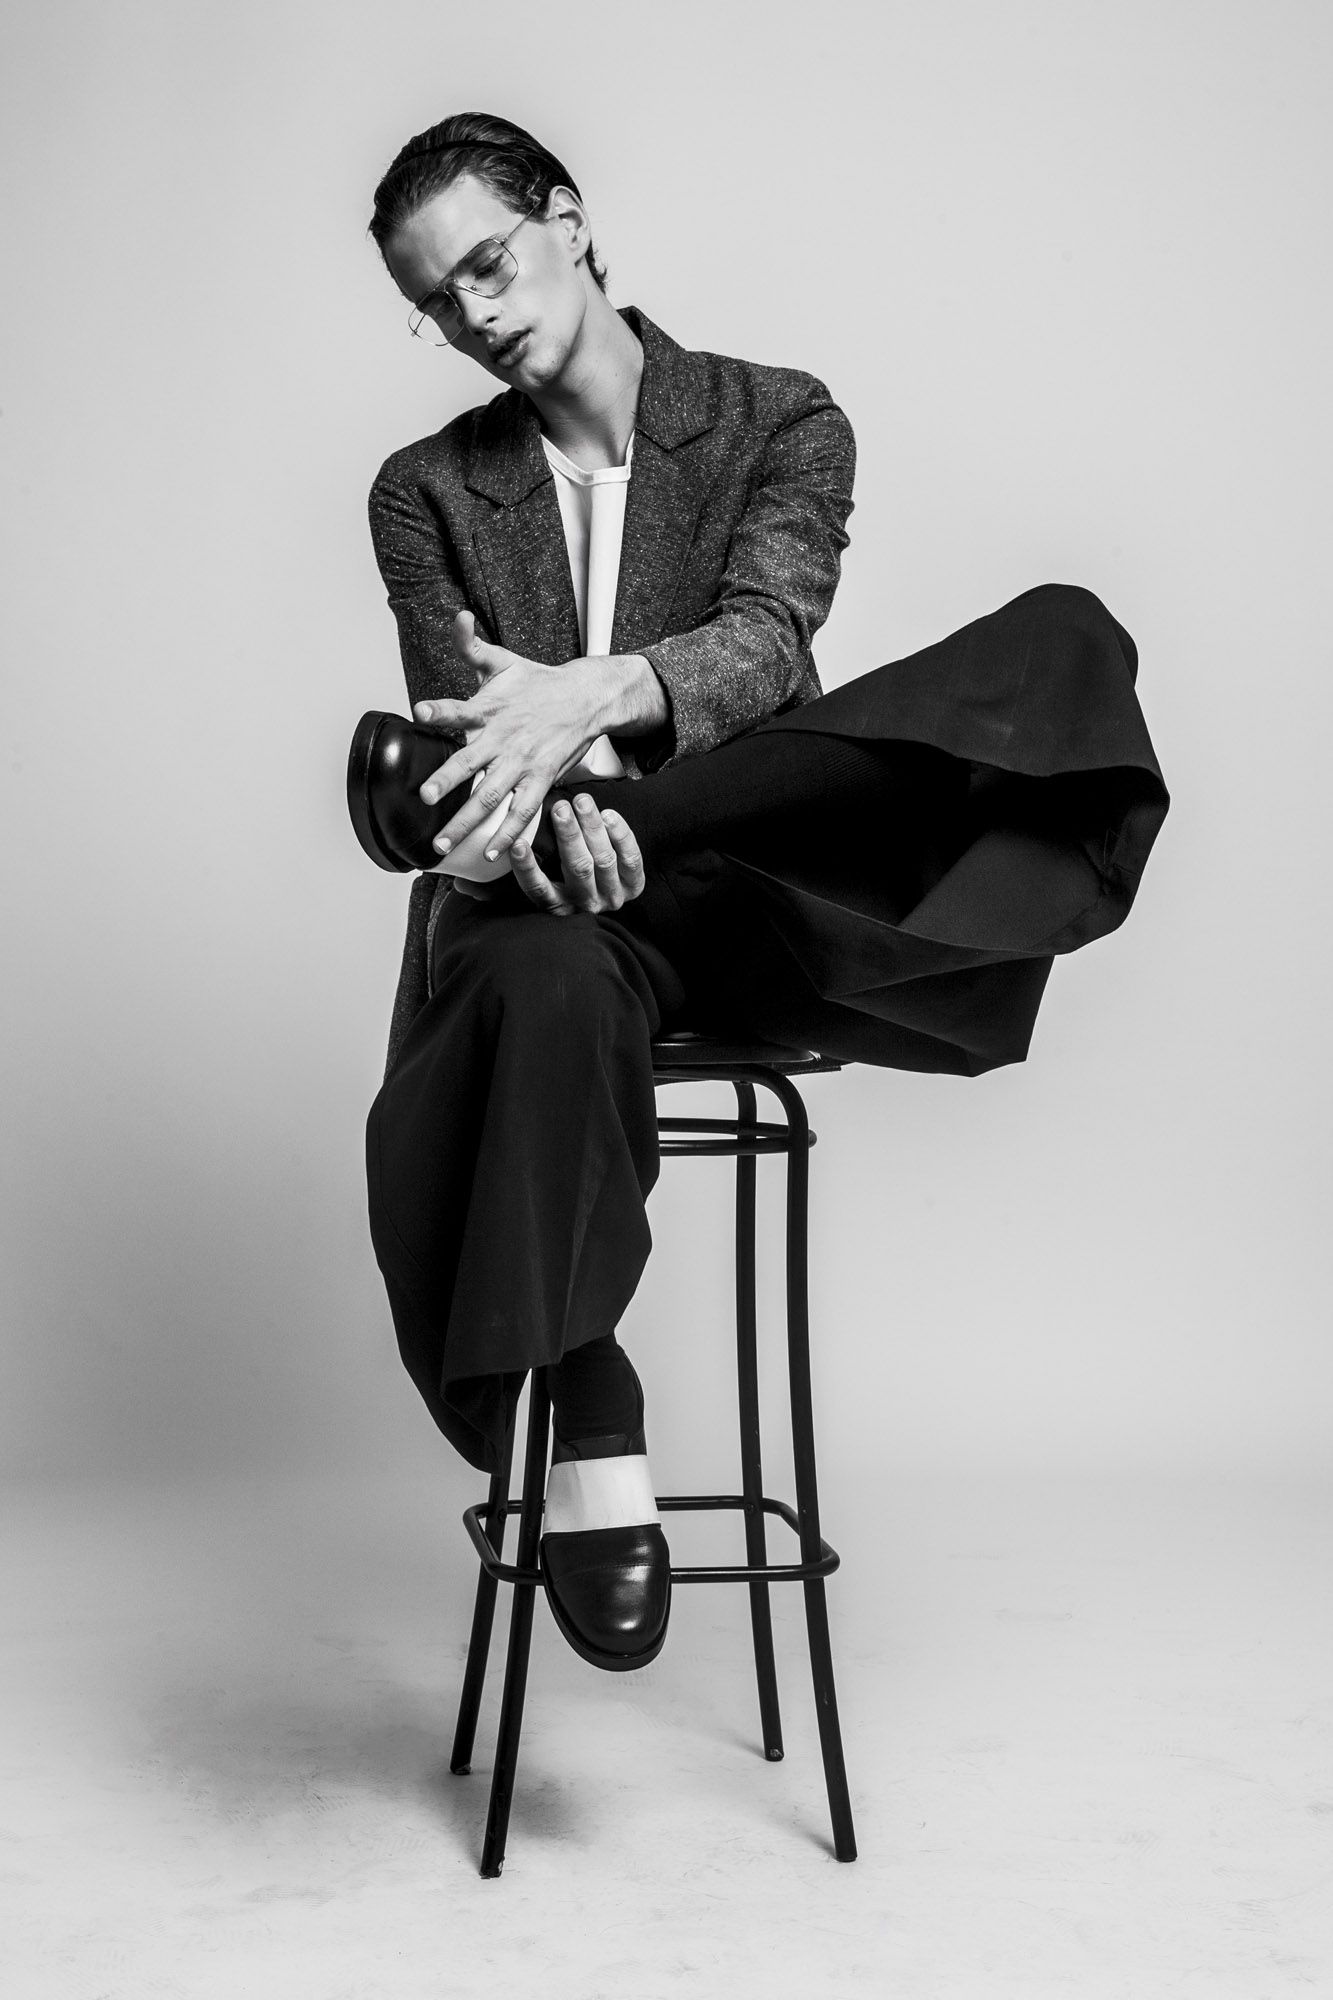 Riccardo Mora by Antonino Cafiero for CHASSEUR MAGAZINE